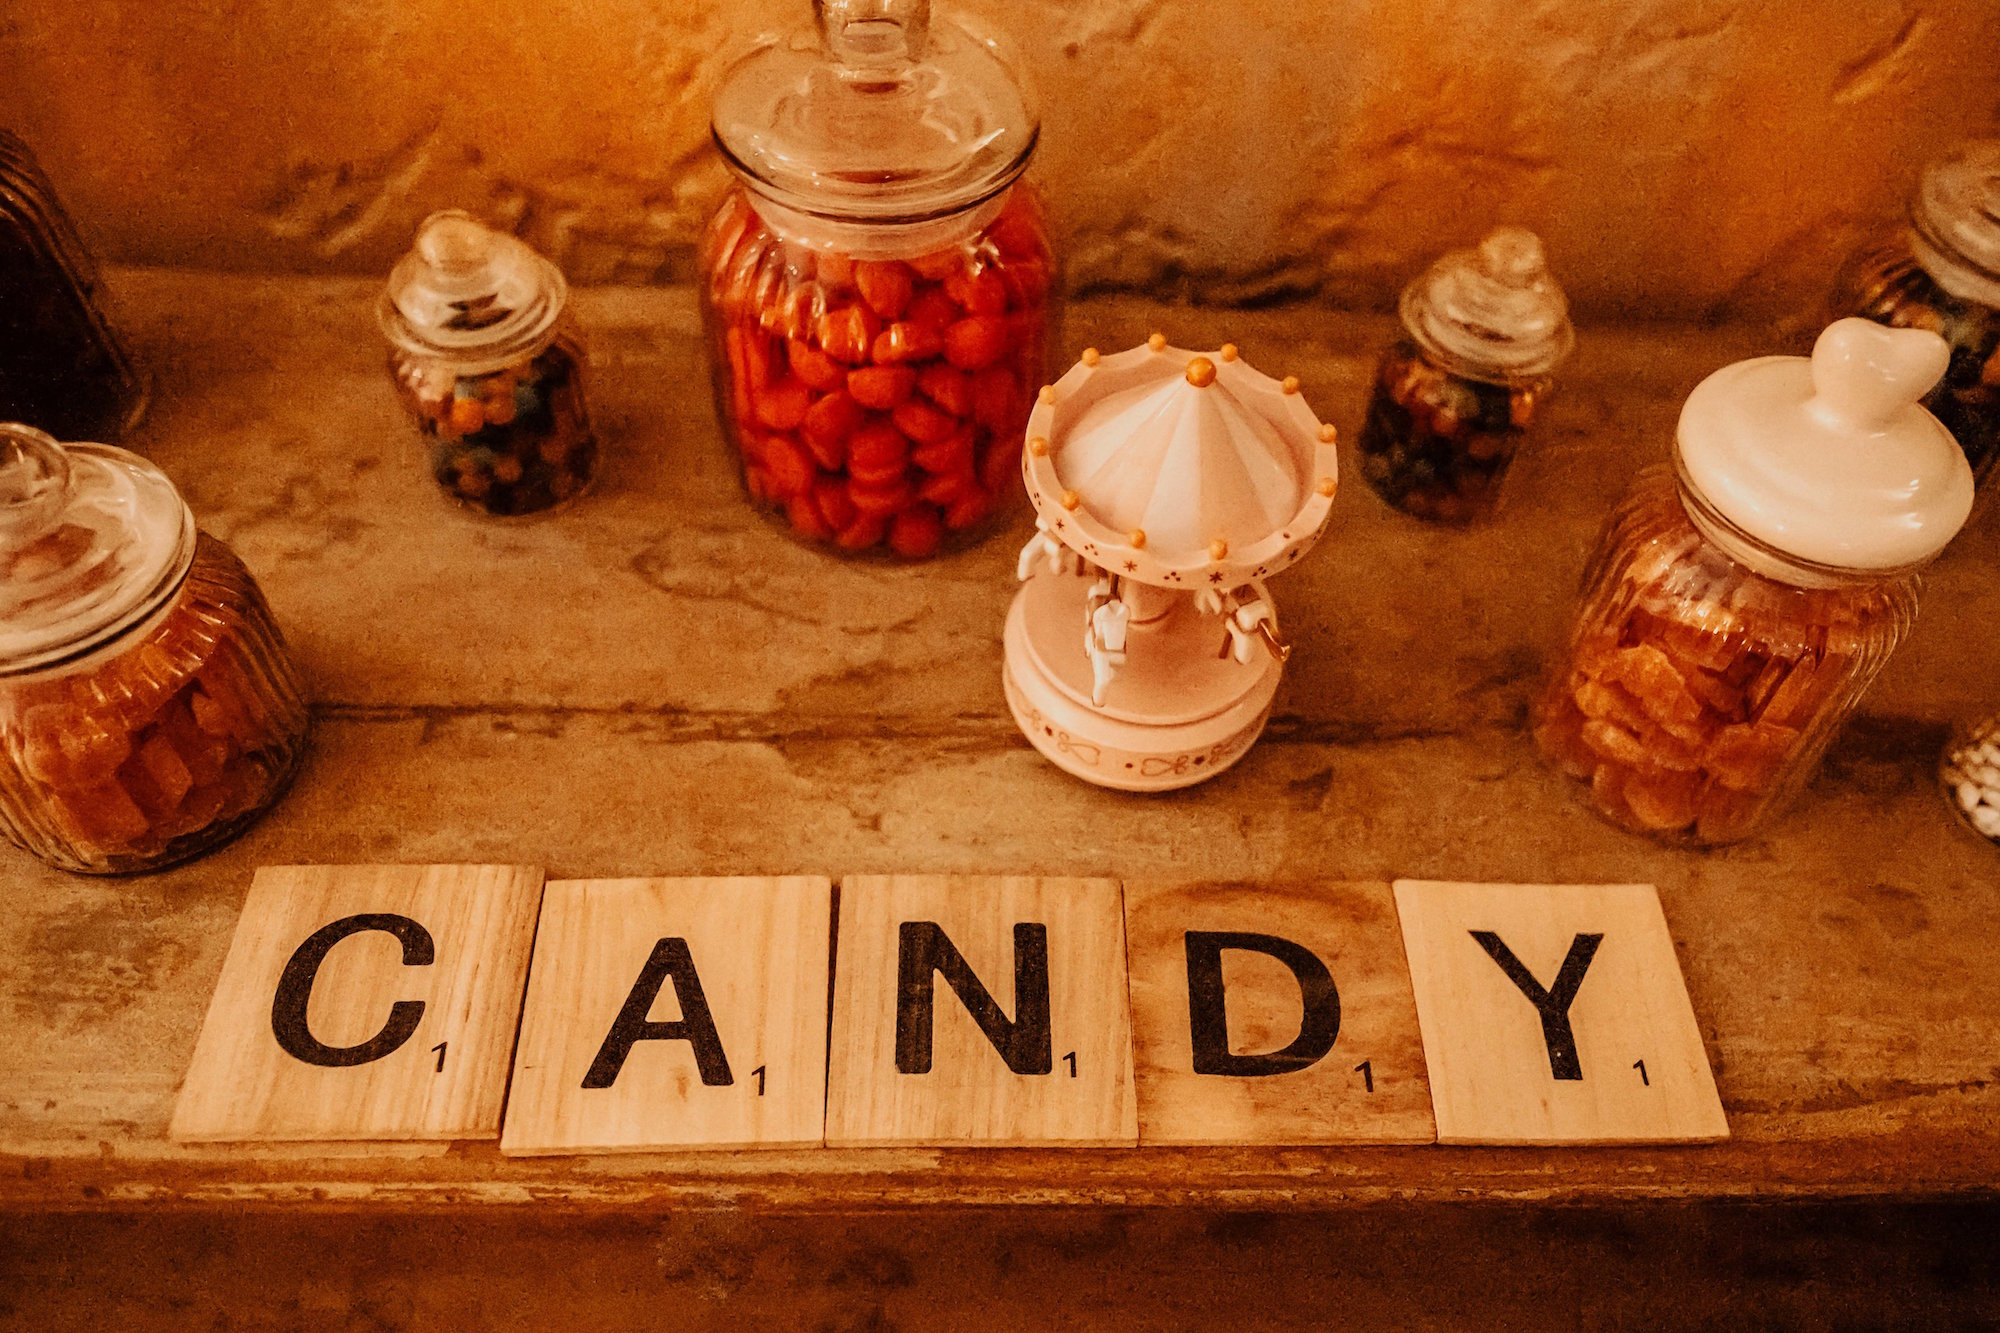 le coeur dans les etoiles - wedding planner - provence - luberon - alpilles - organisation - mariage - wedding - florine jeannot - candy bar